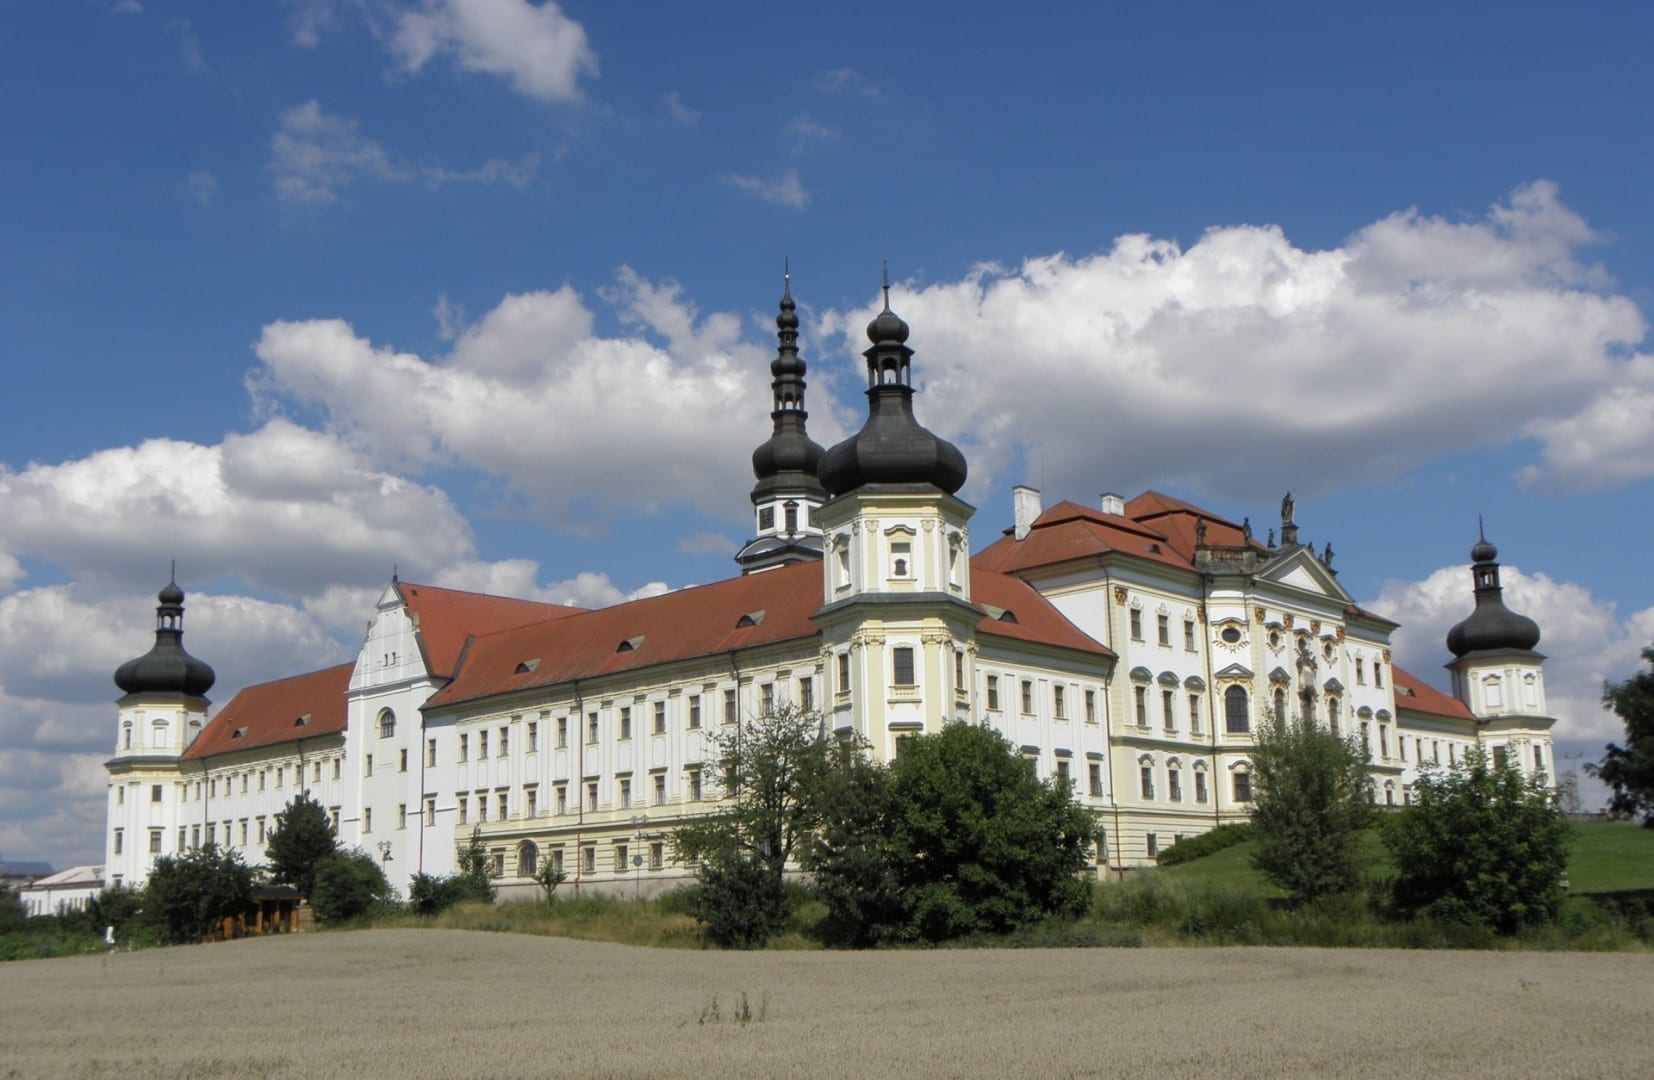 Monasterios de Hradisko Olomouc República Checa